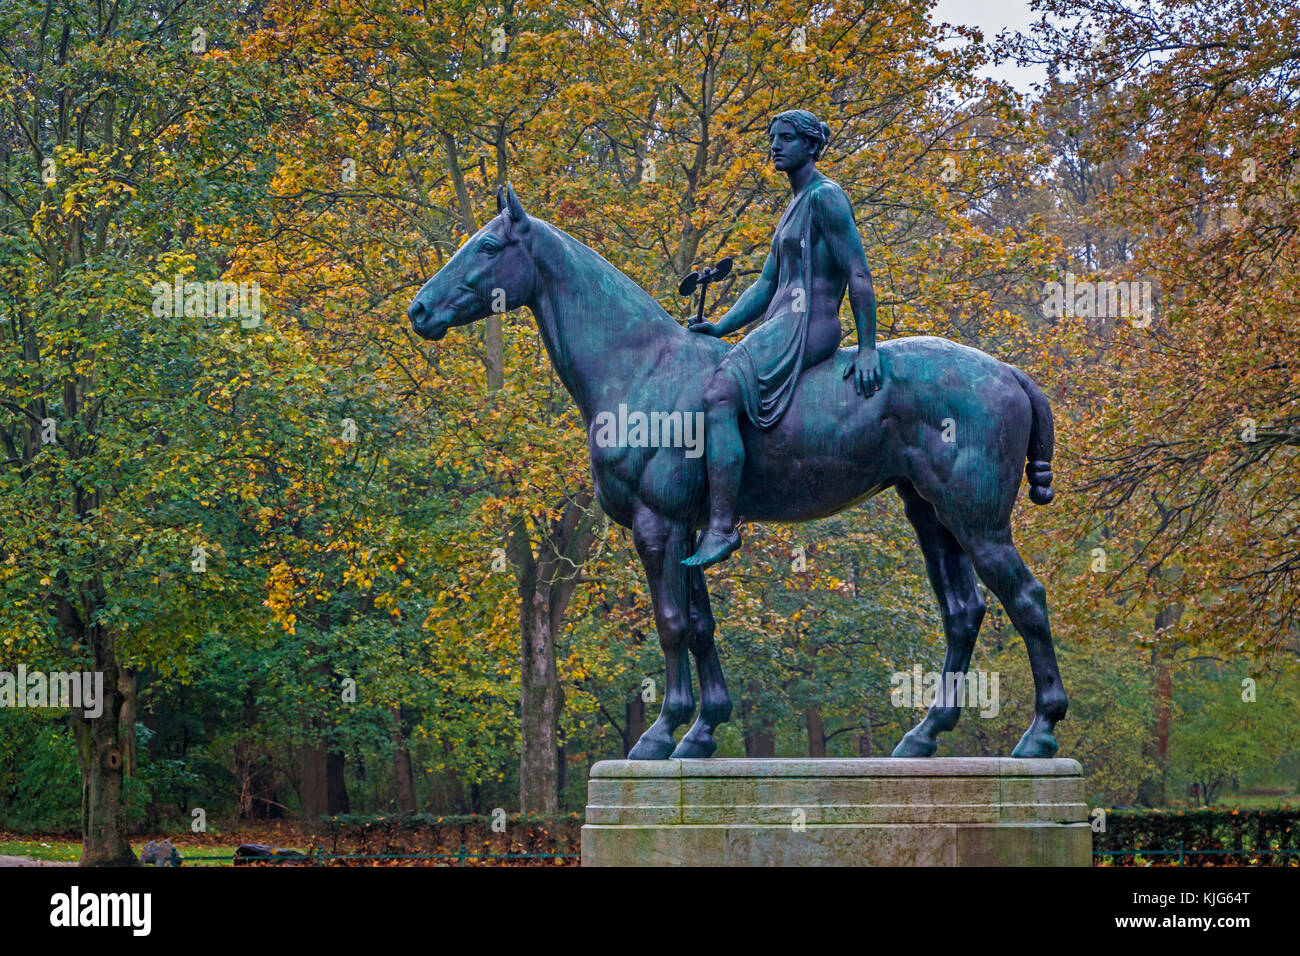 The 1895 Amazone zu Pferde or Amazon On Horseback sculpture by Prussian sculptor Louis Tuaillon in the Tiergarten - Stock Image